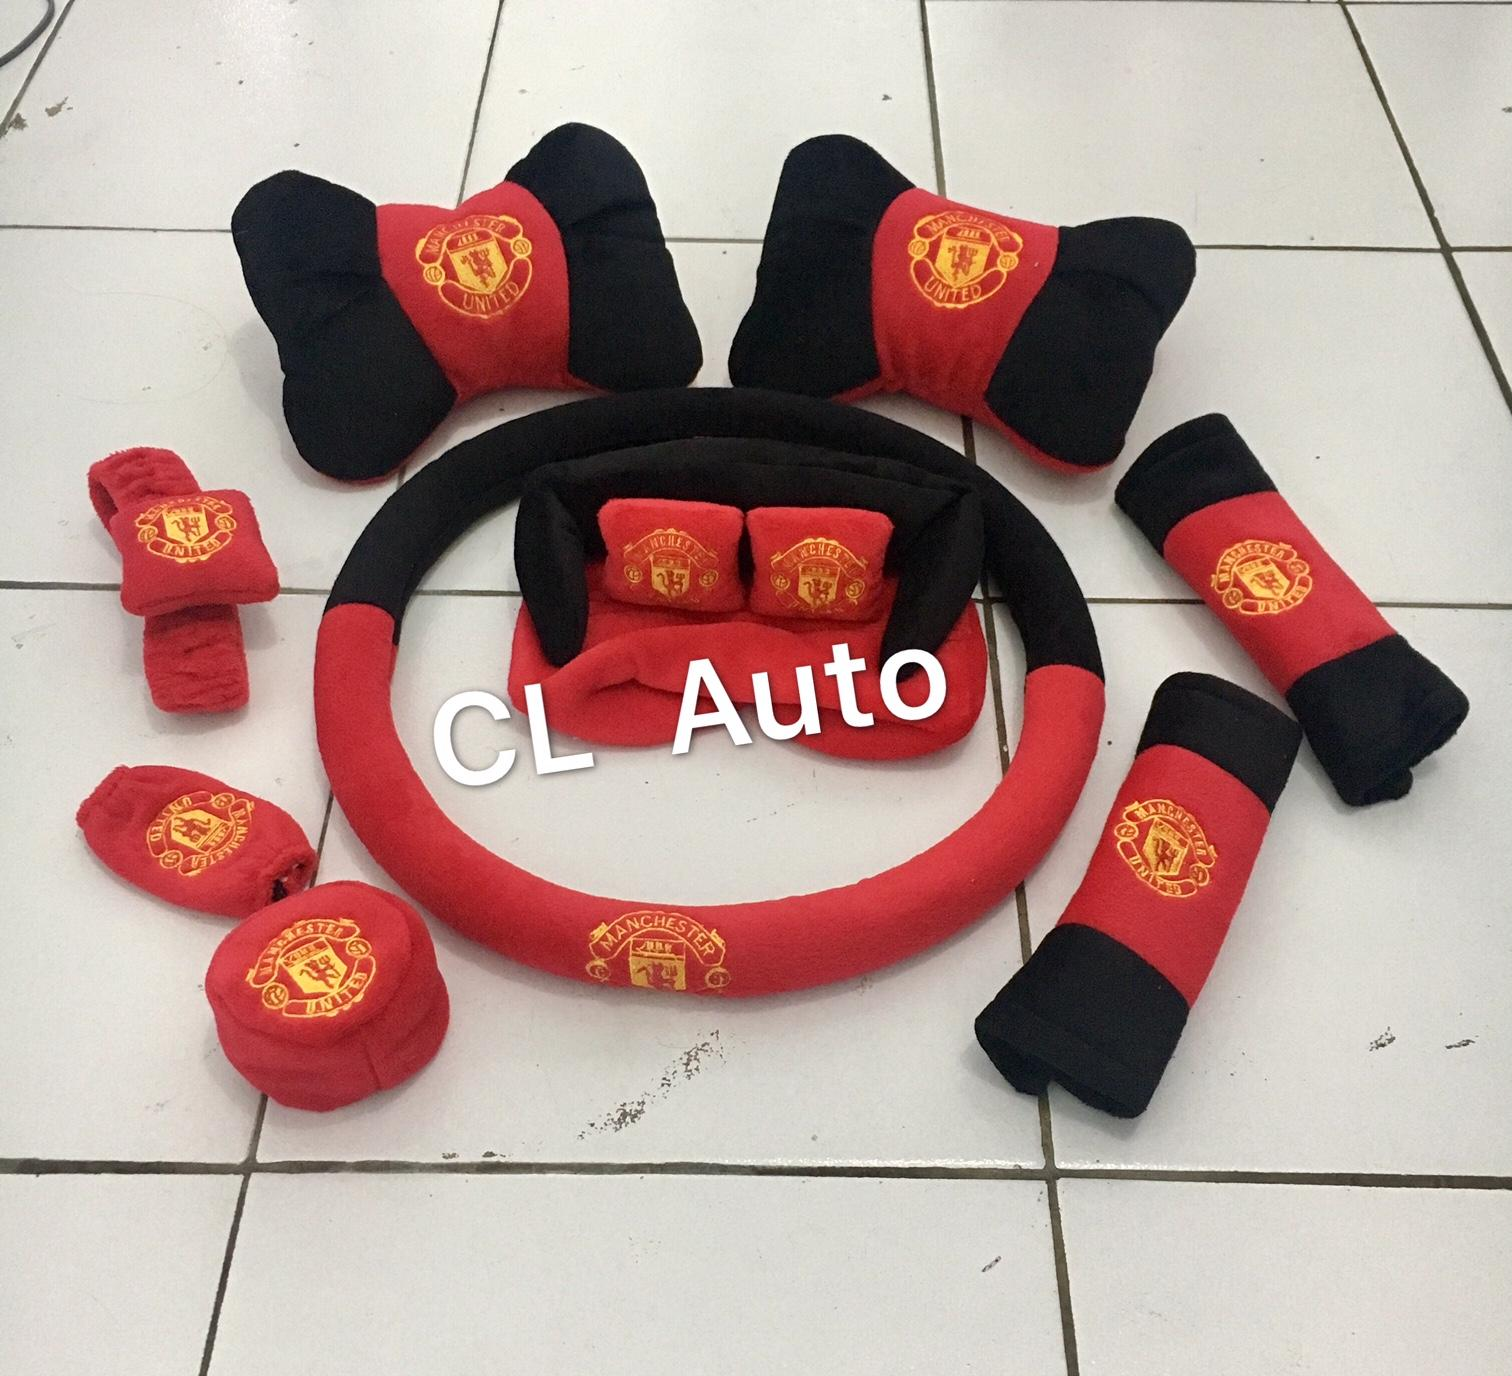 Bantal set mobil 7in1 model MU warna merah / Aksesoris bantal set mobil 7 in 1 murah unik lucu UNIVERSAL / Tempat tissue manchaster united / sarung bantal mobil 9in1 warna red